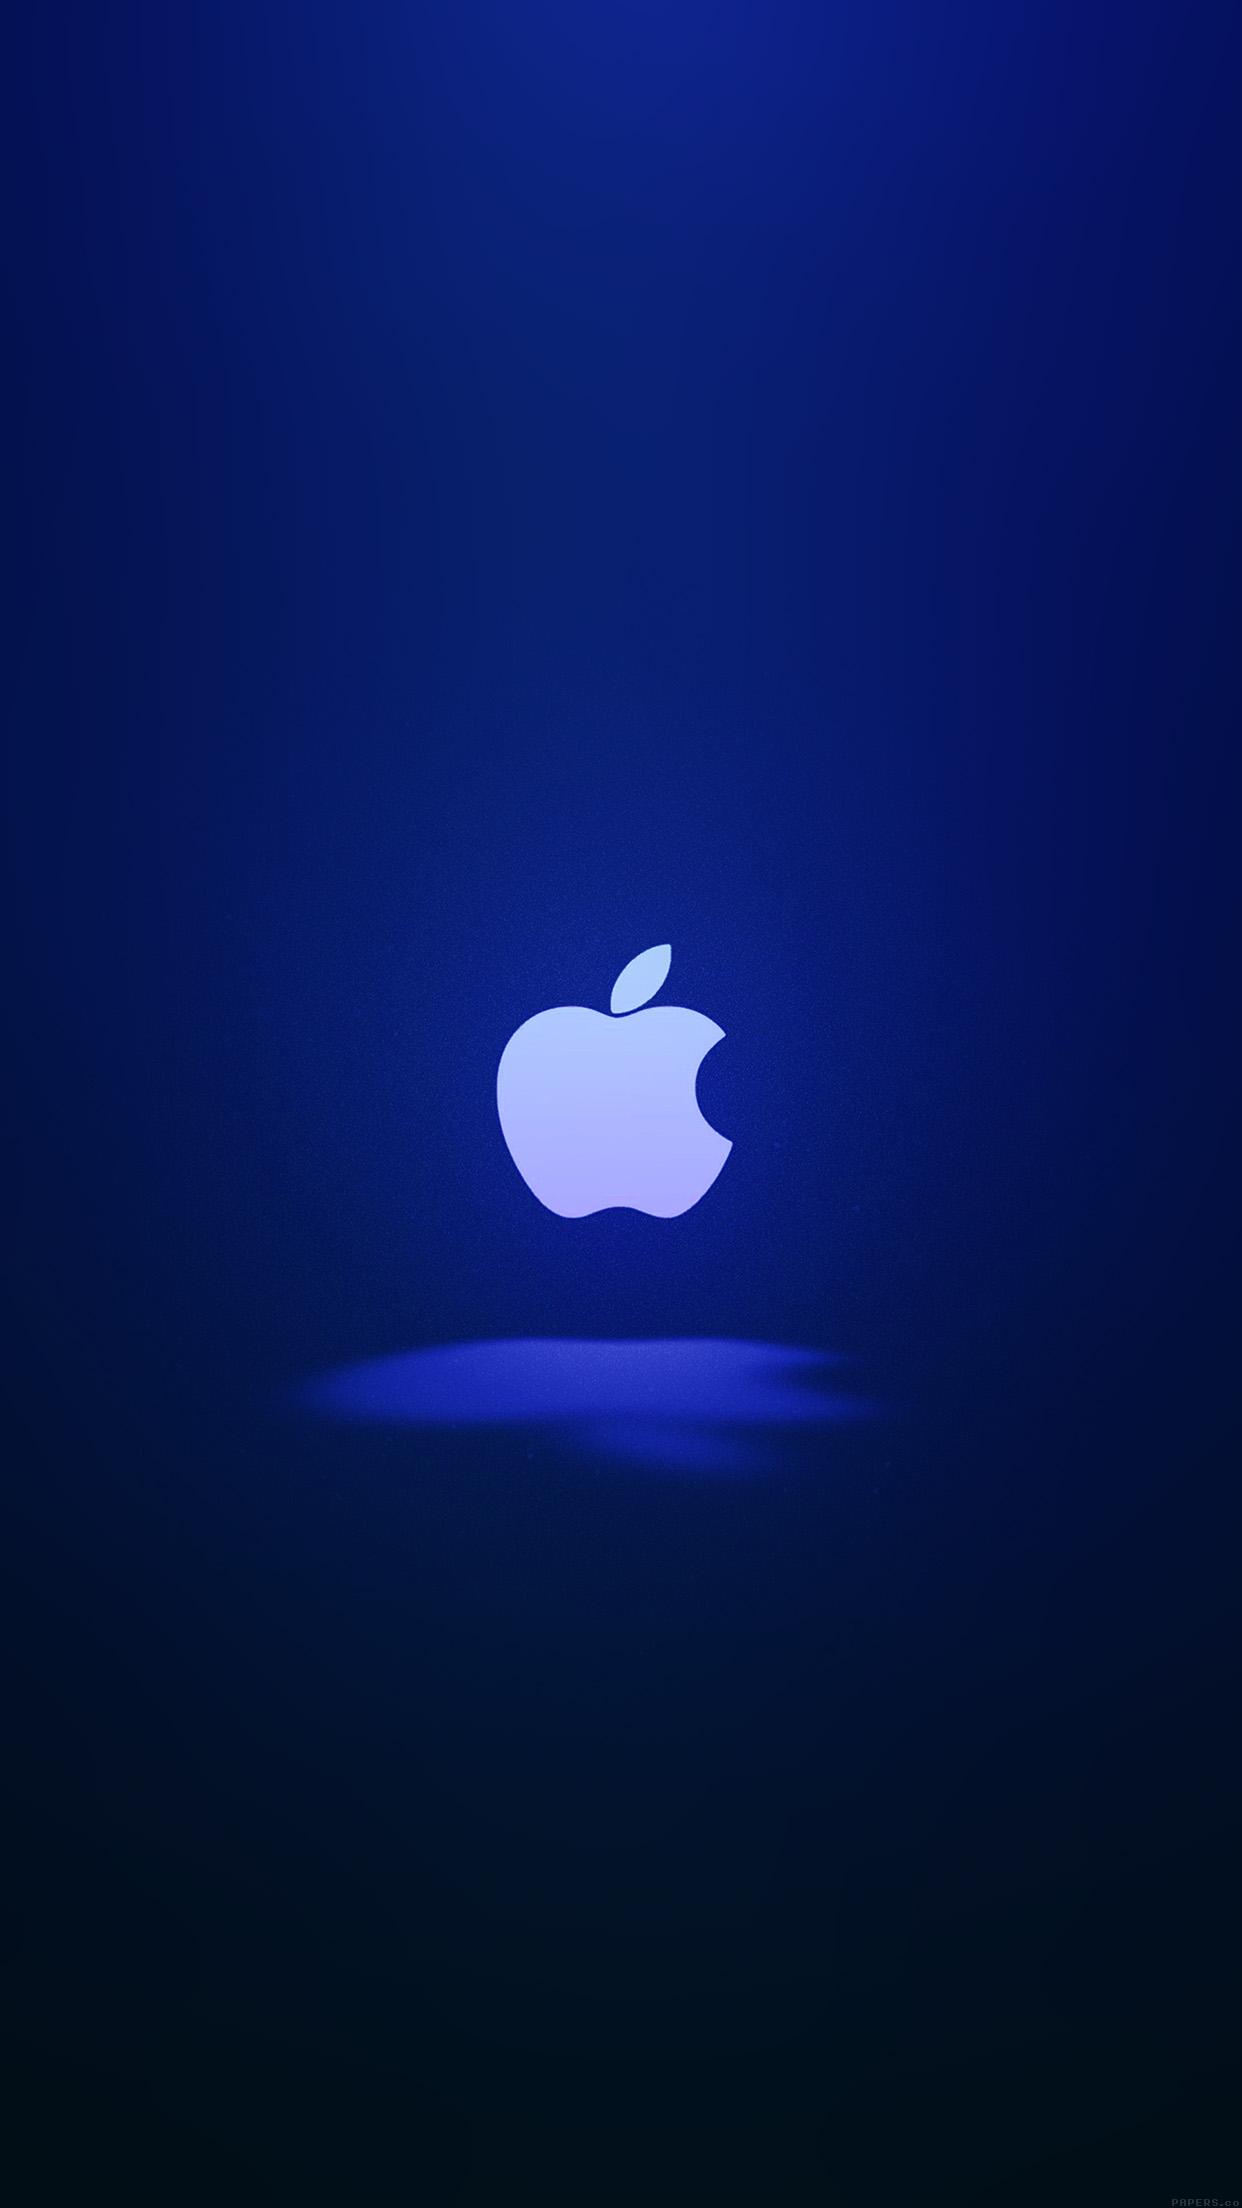 Wallpapers Of The Week Apple Logo